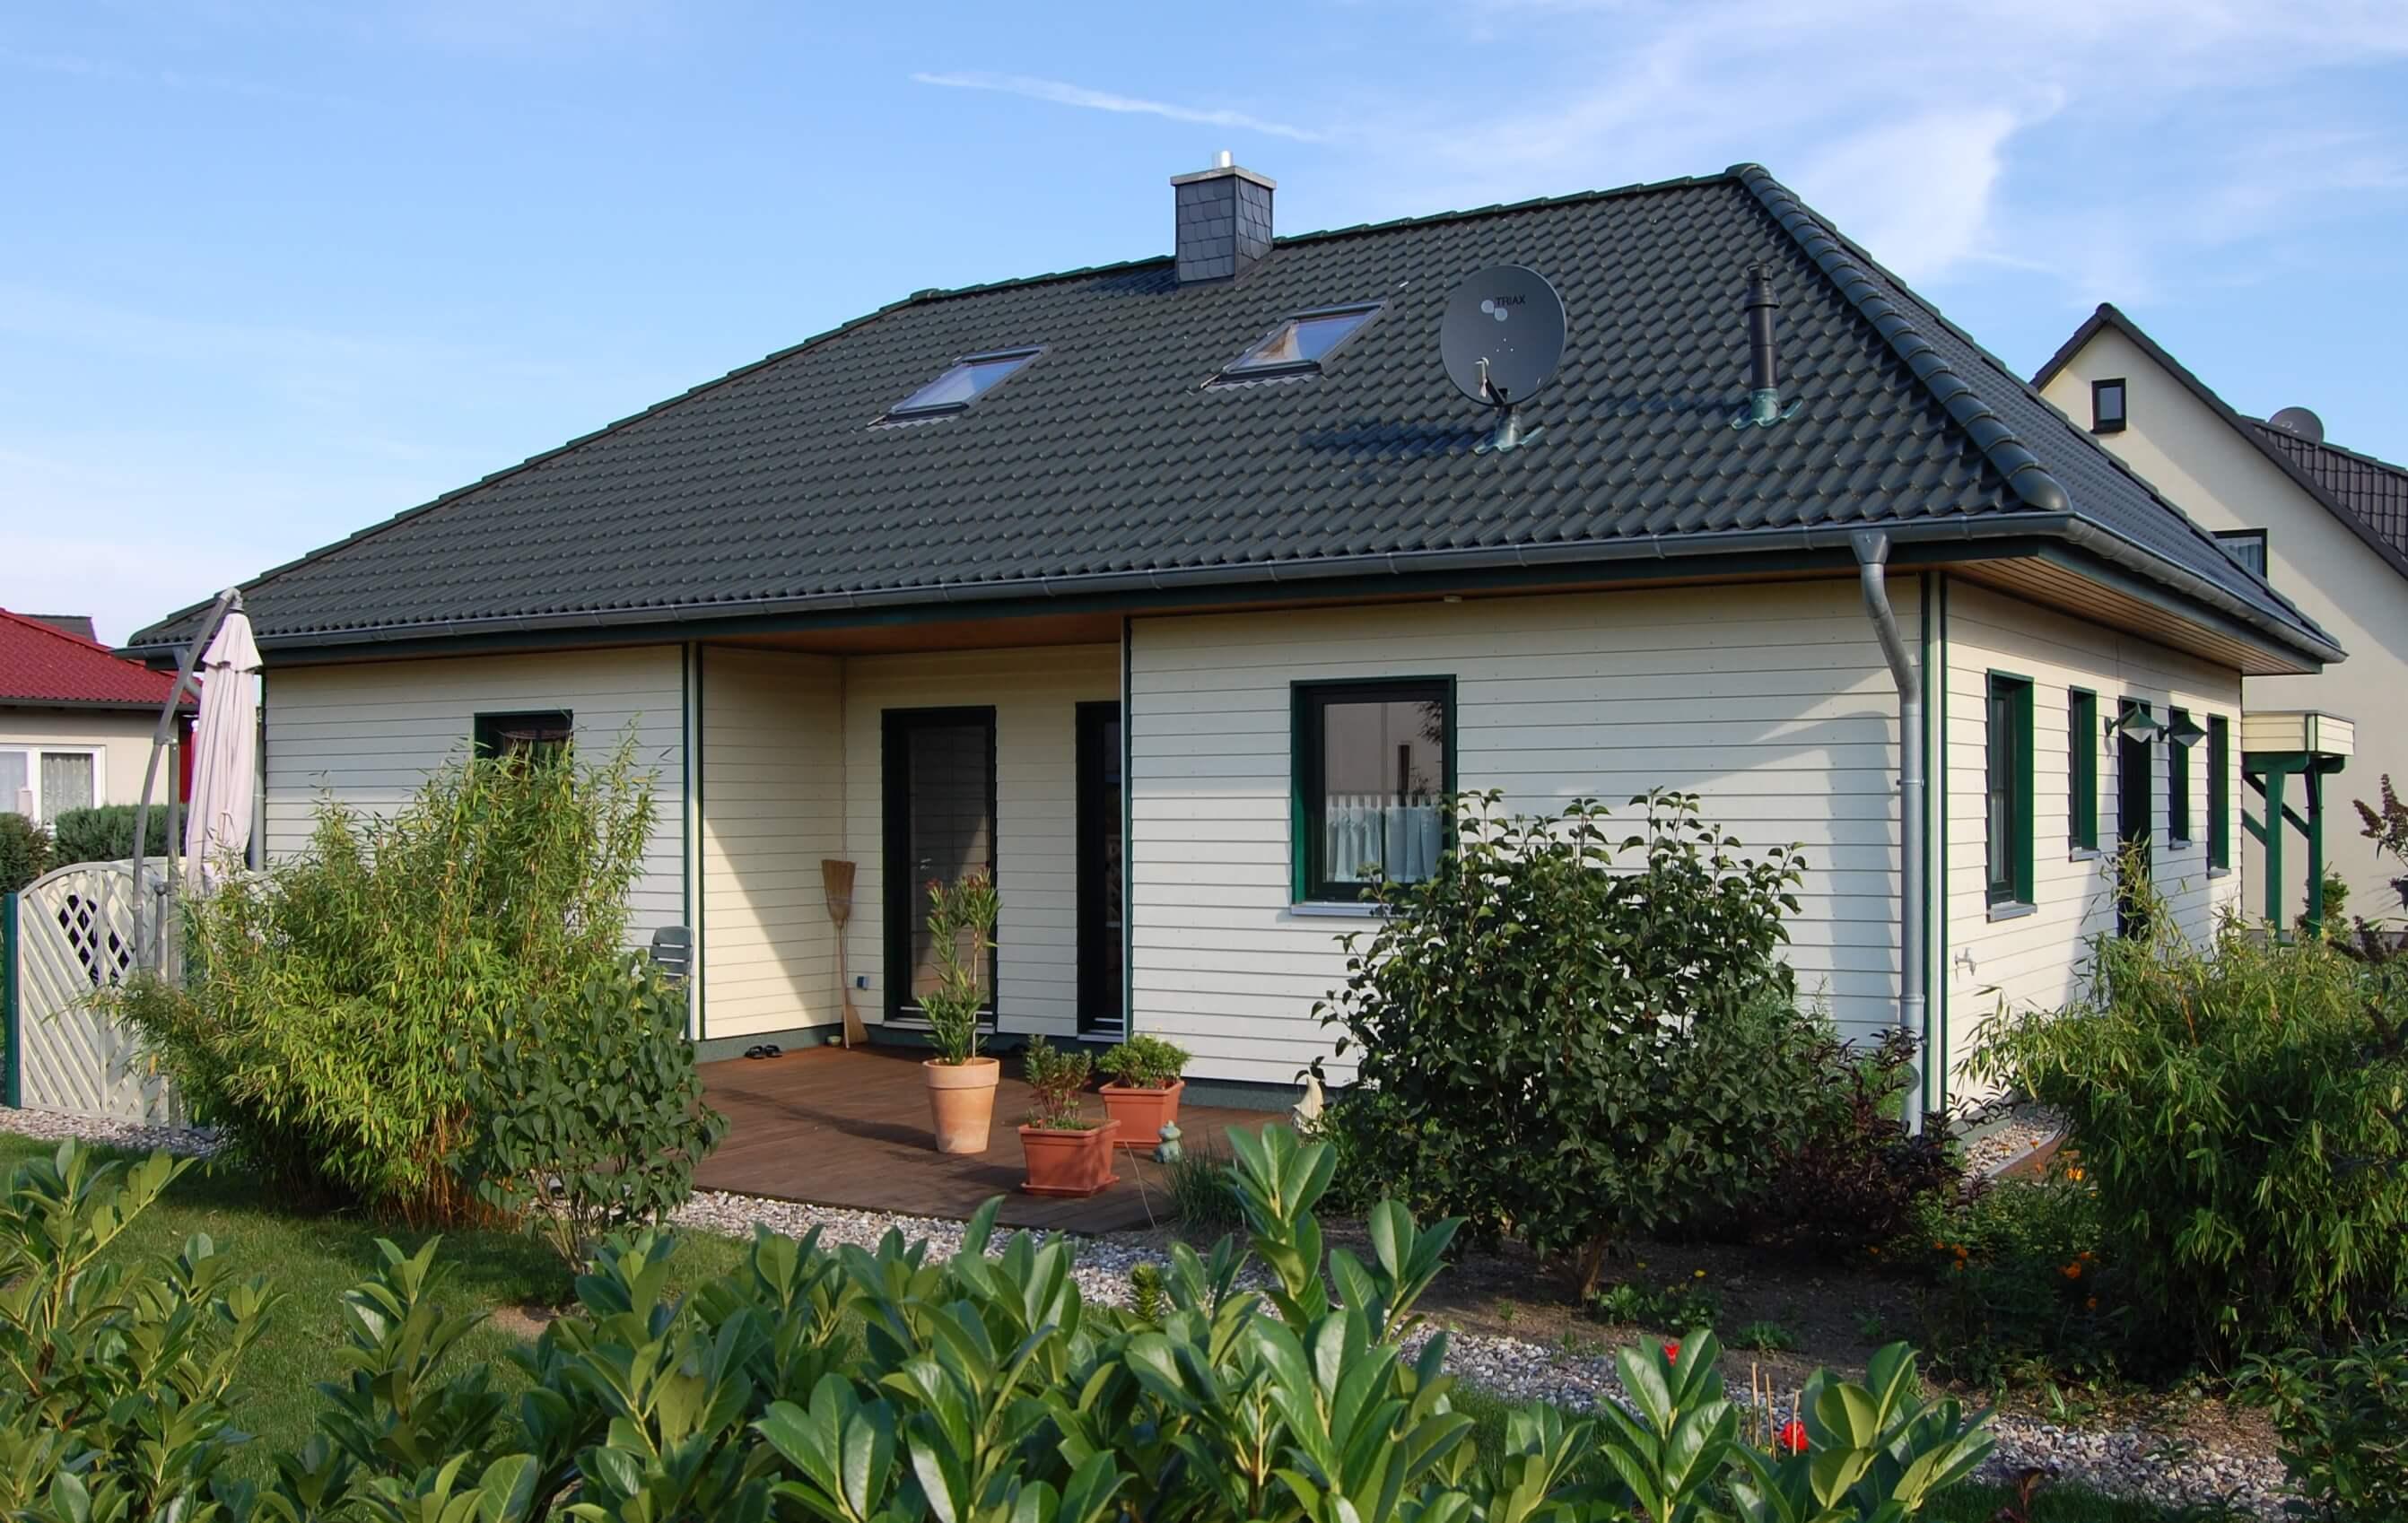 Einfamilienhaus in Holzrahmenbauweise (LŸübstorf)